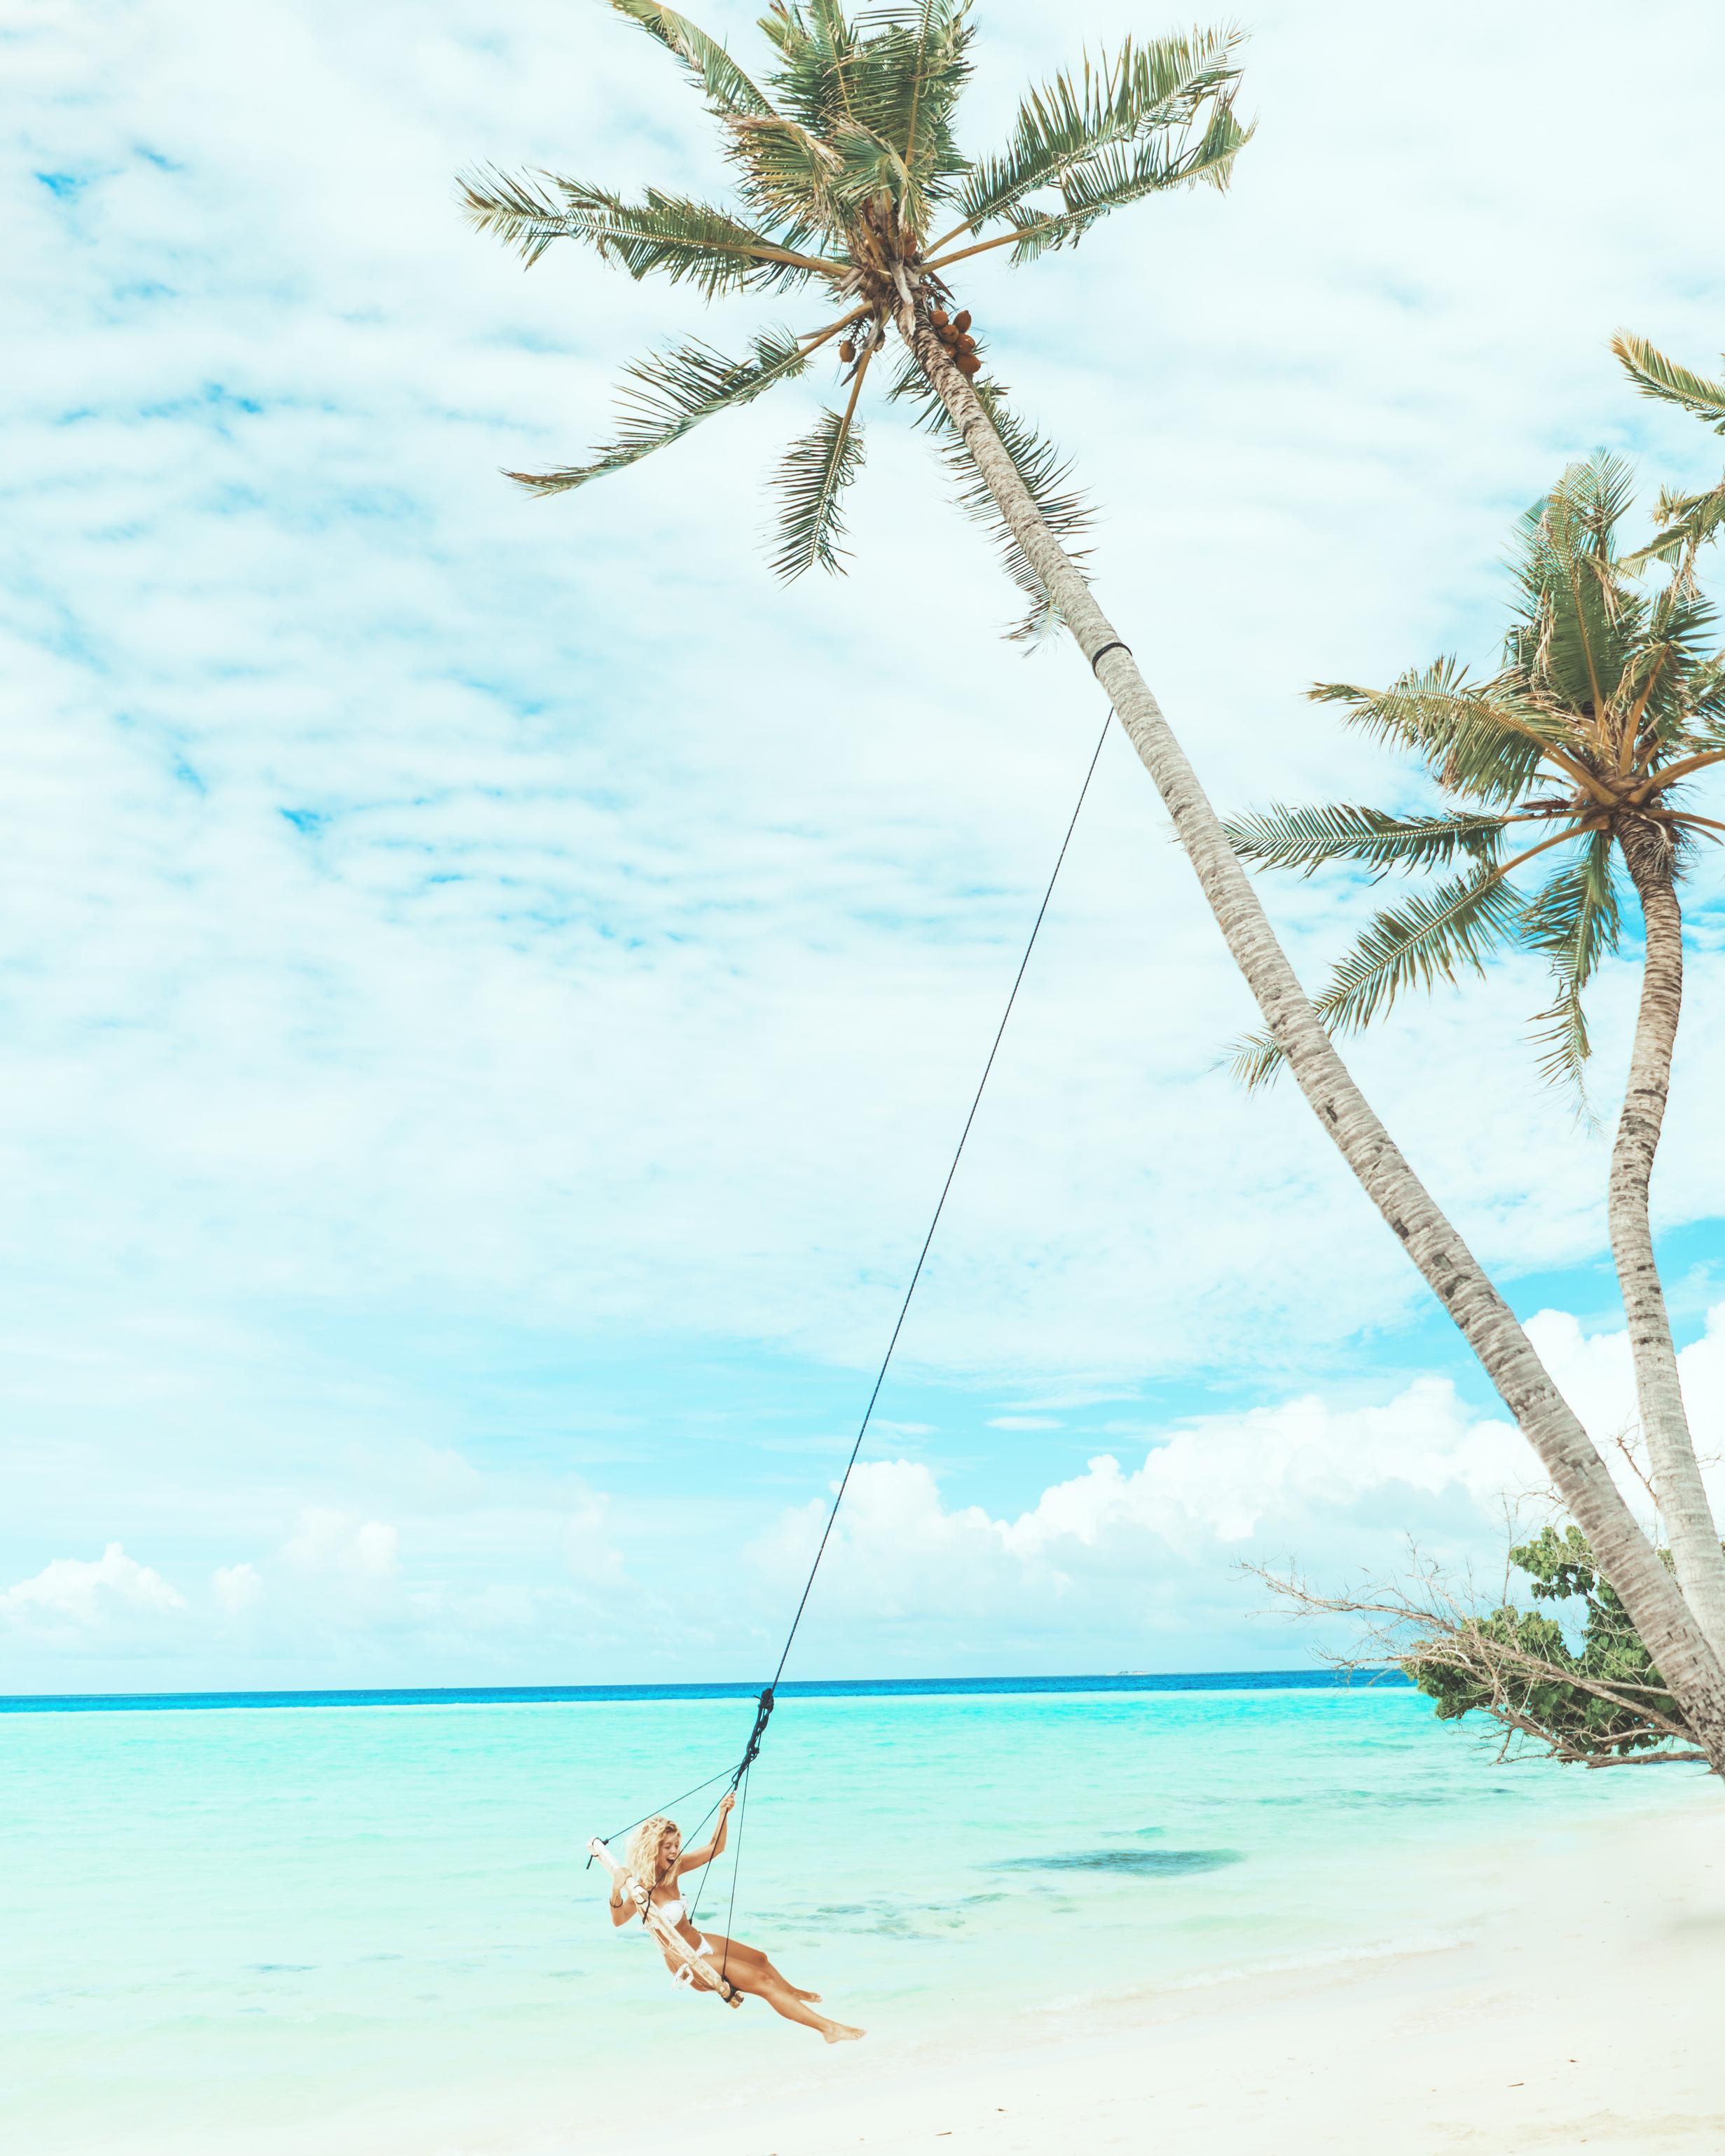 maldives travel guide.jpg